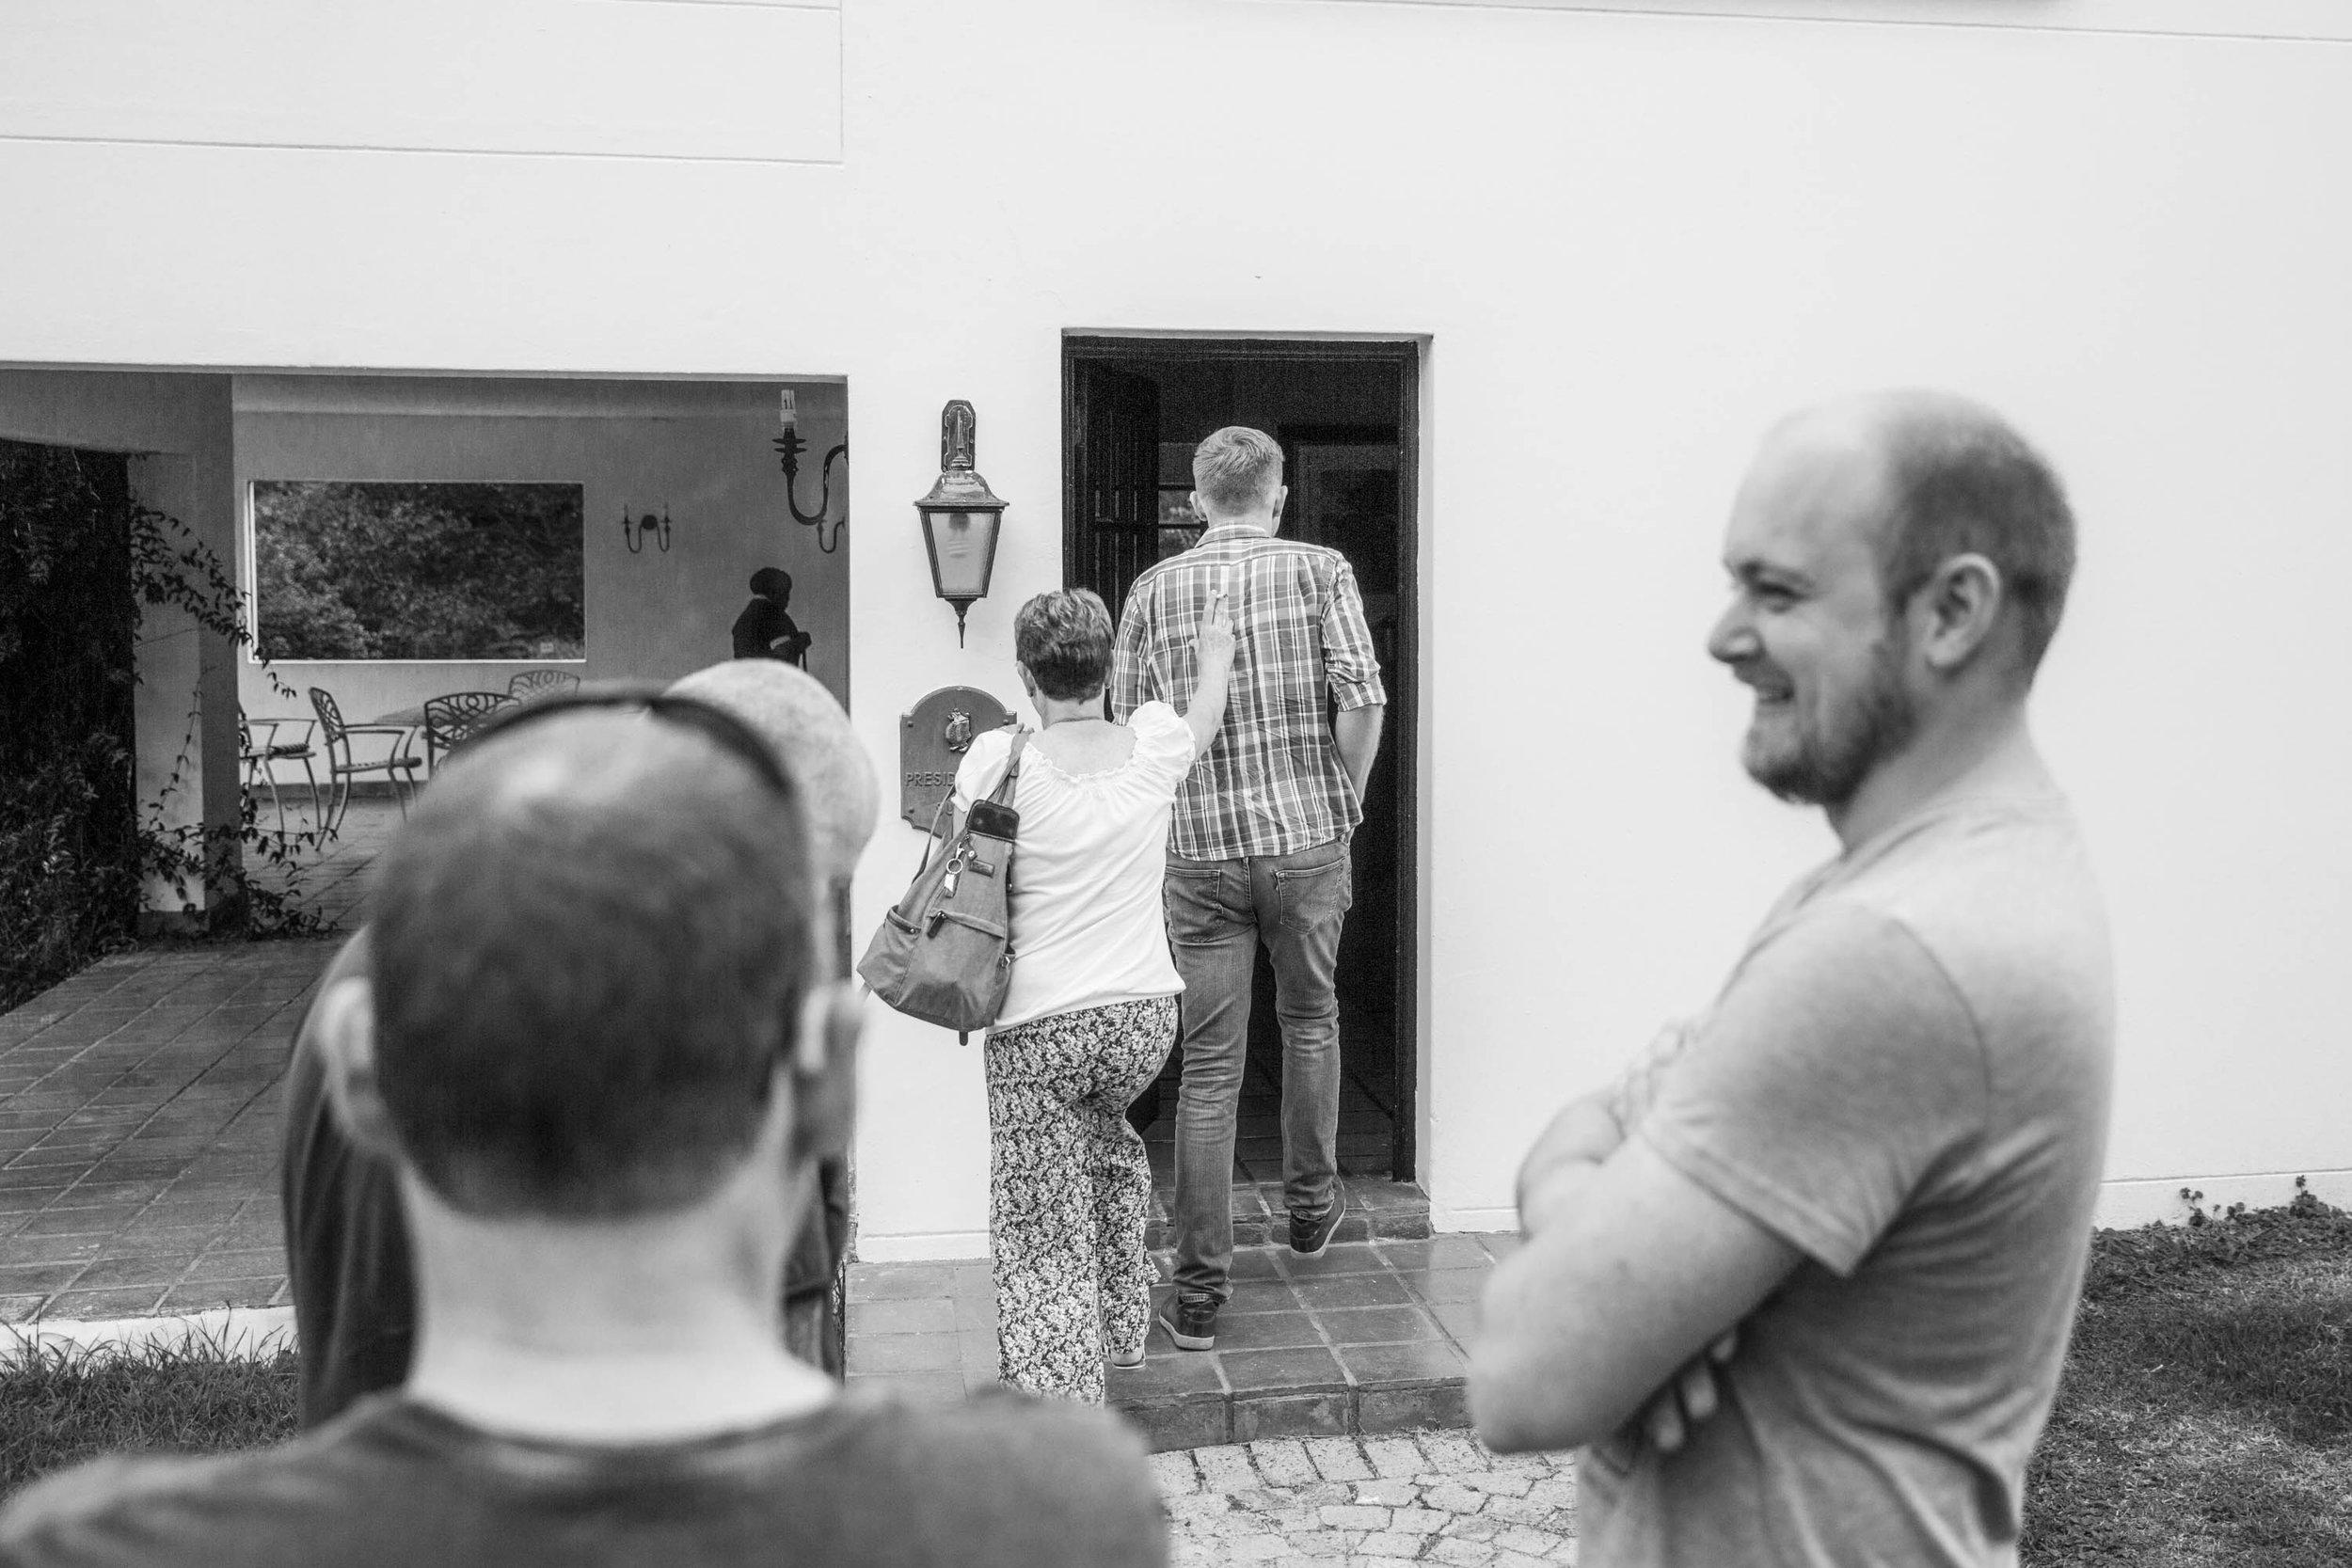 009-Toadburry-Hall-wedding-photographer.JPG